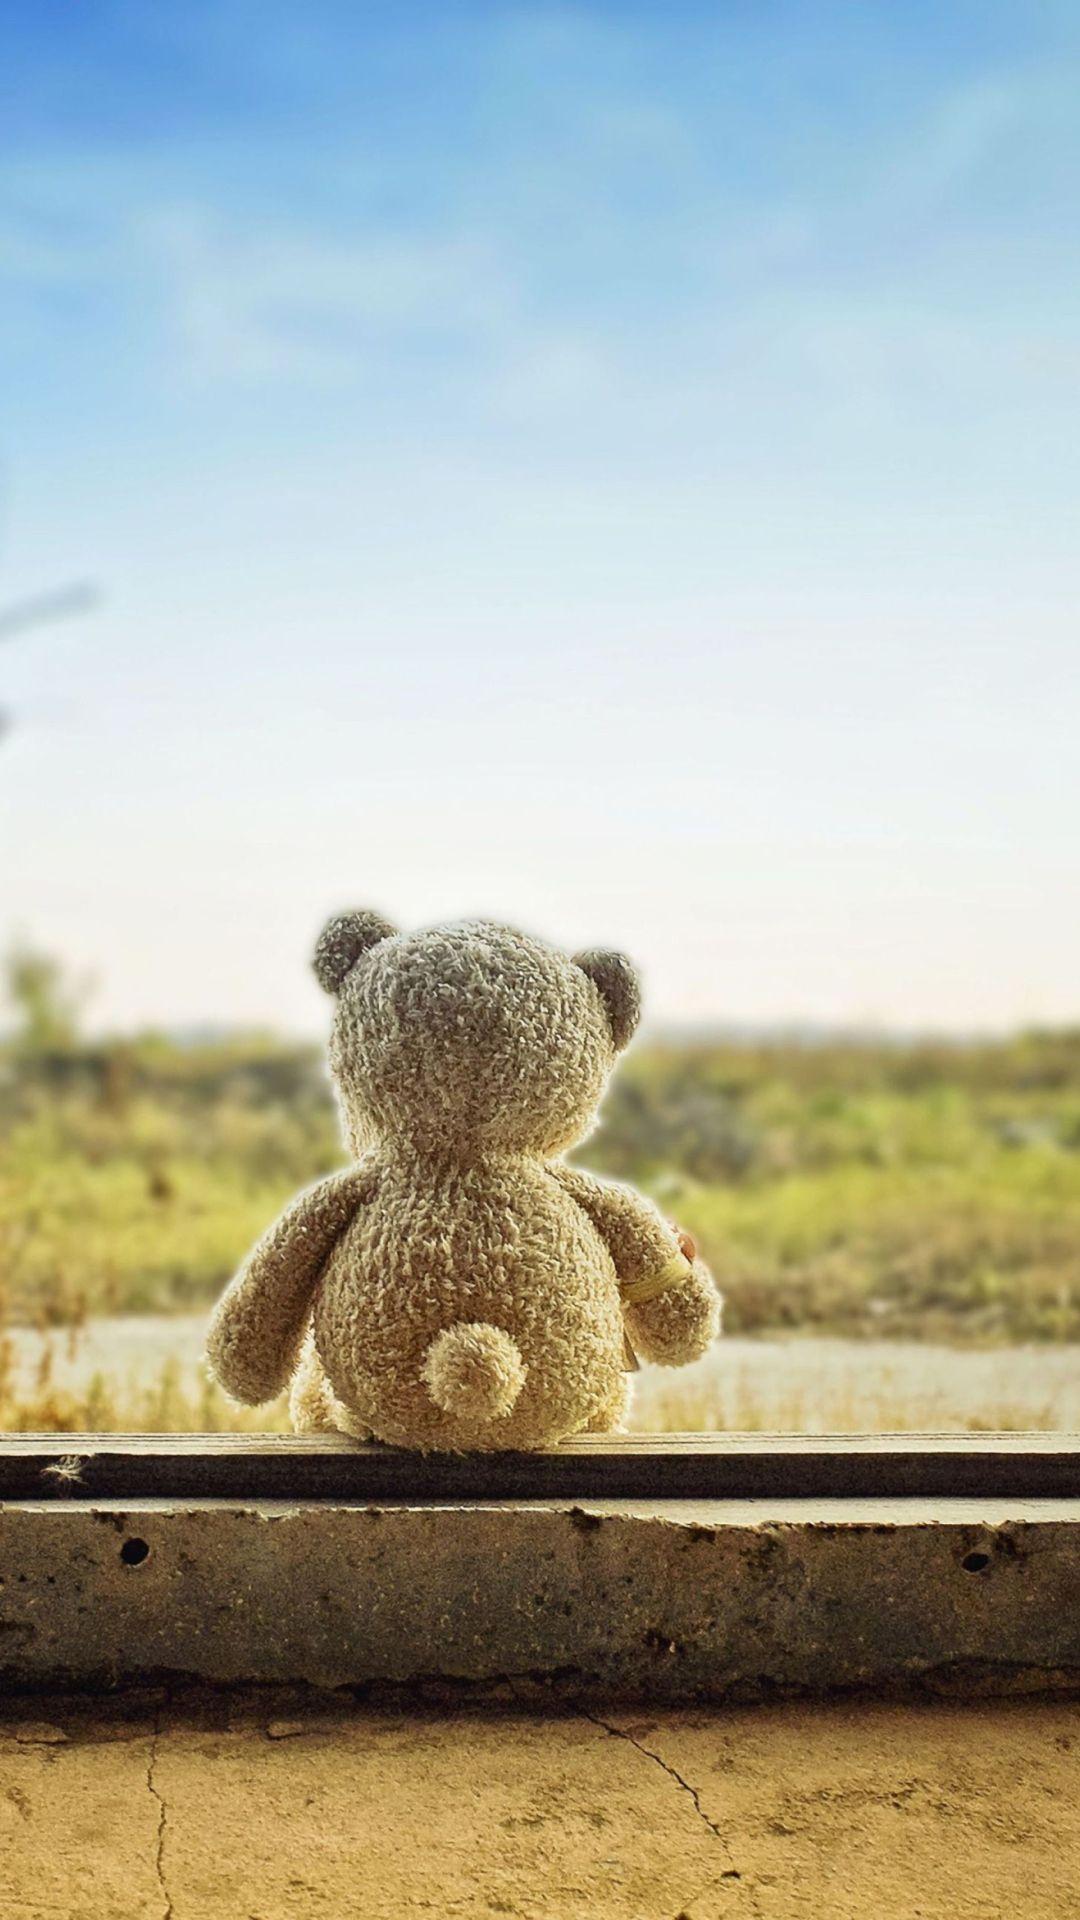 Lonely Teddy Bear Wallpaper For Nokia Lumia